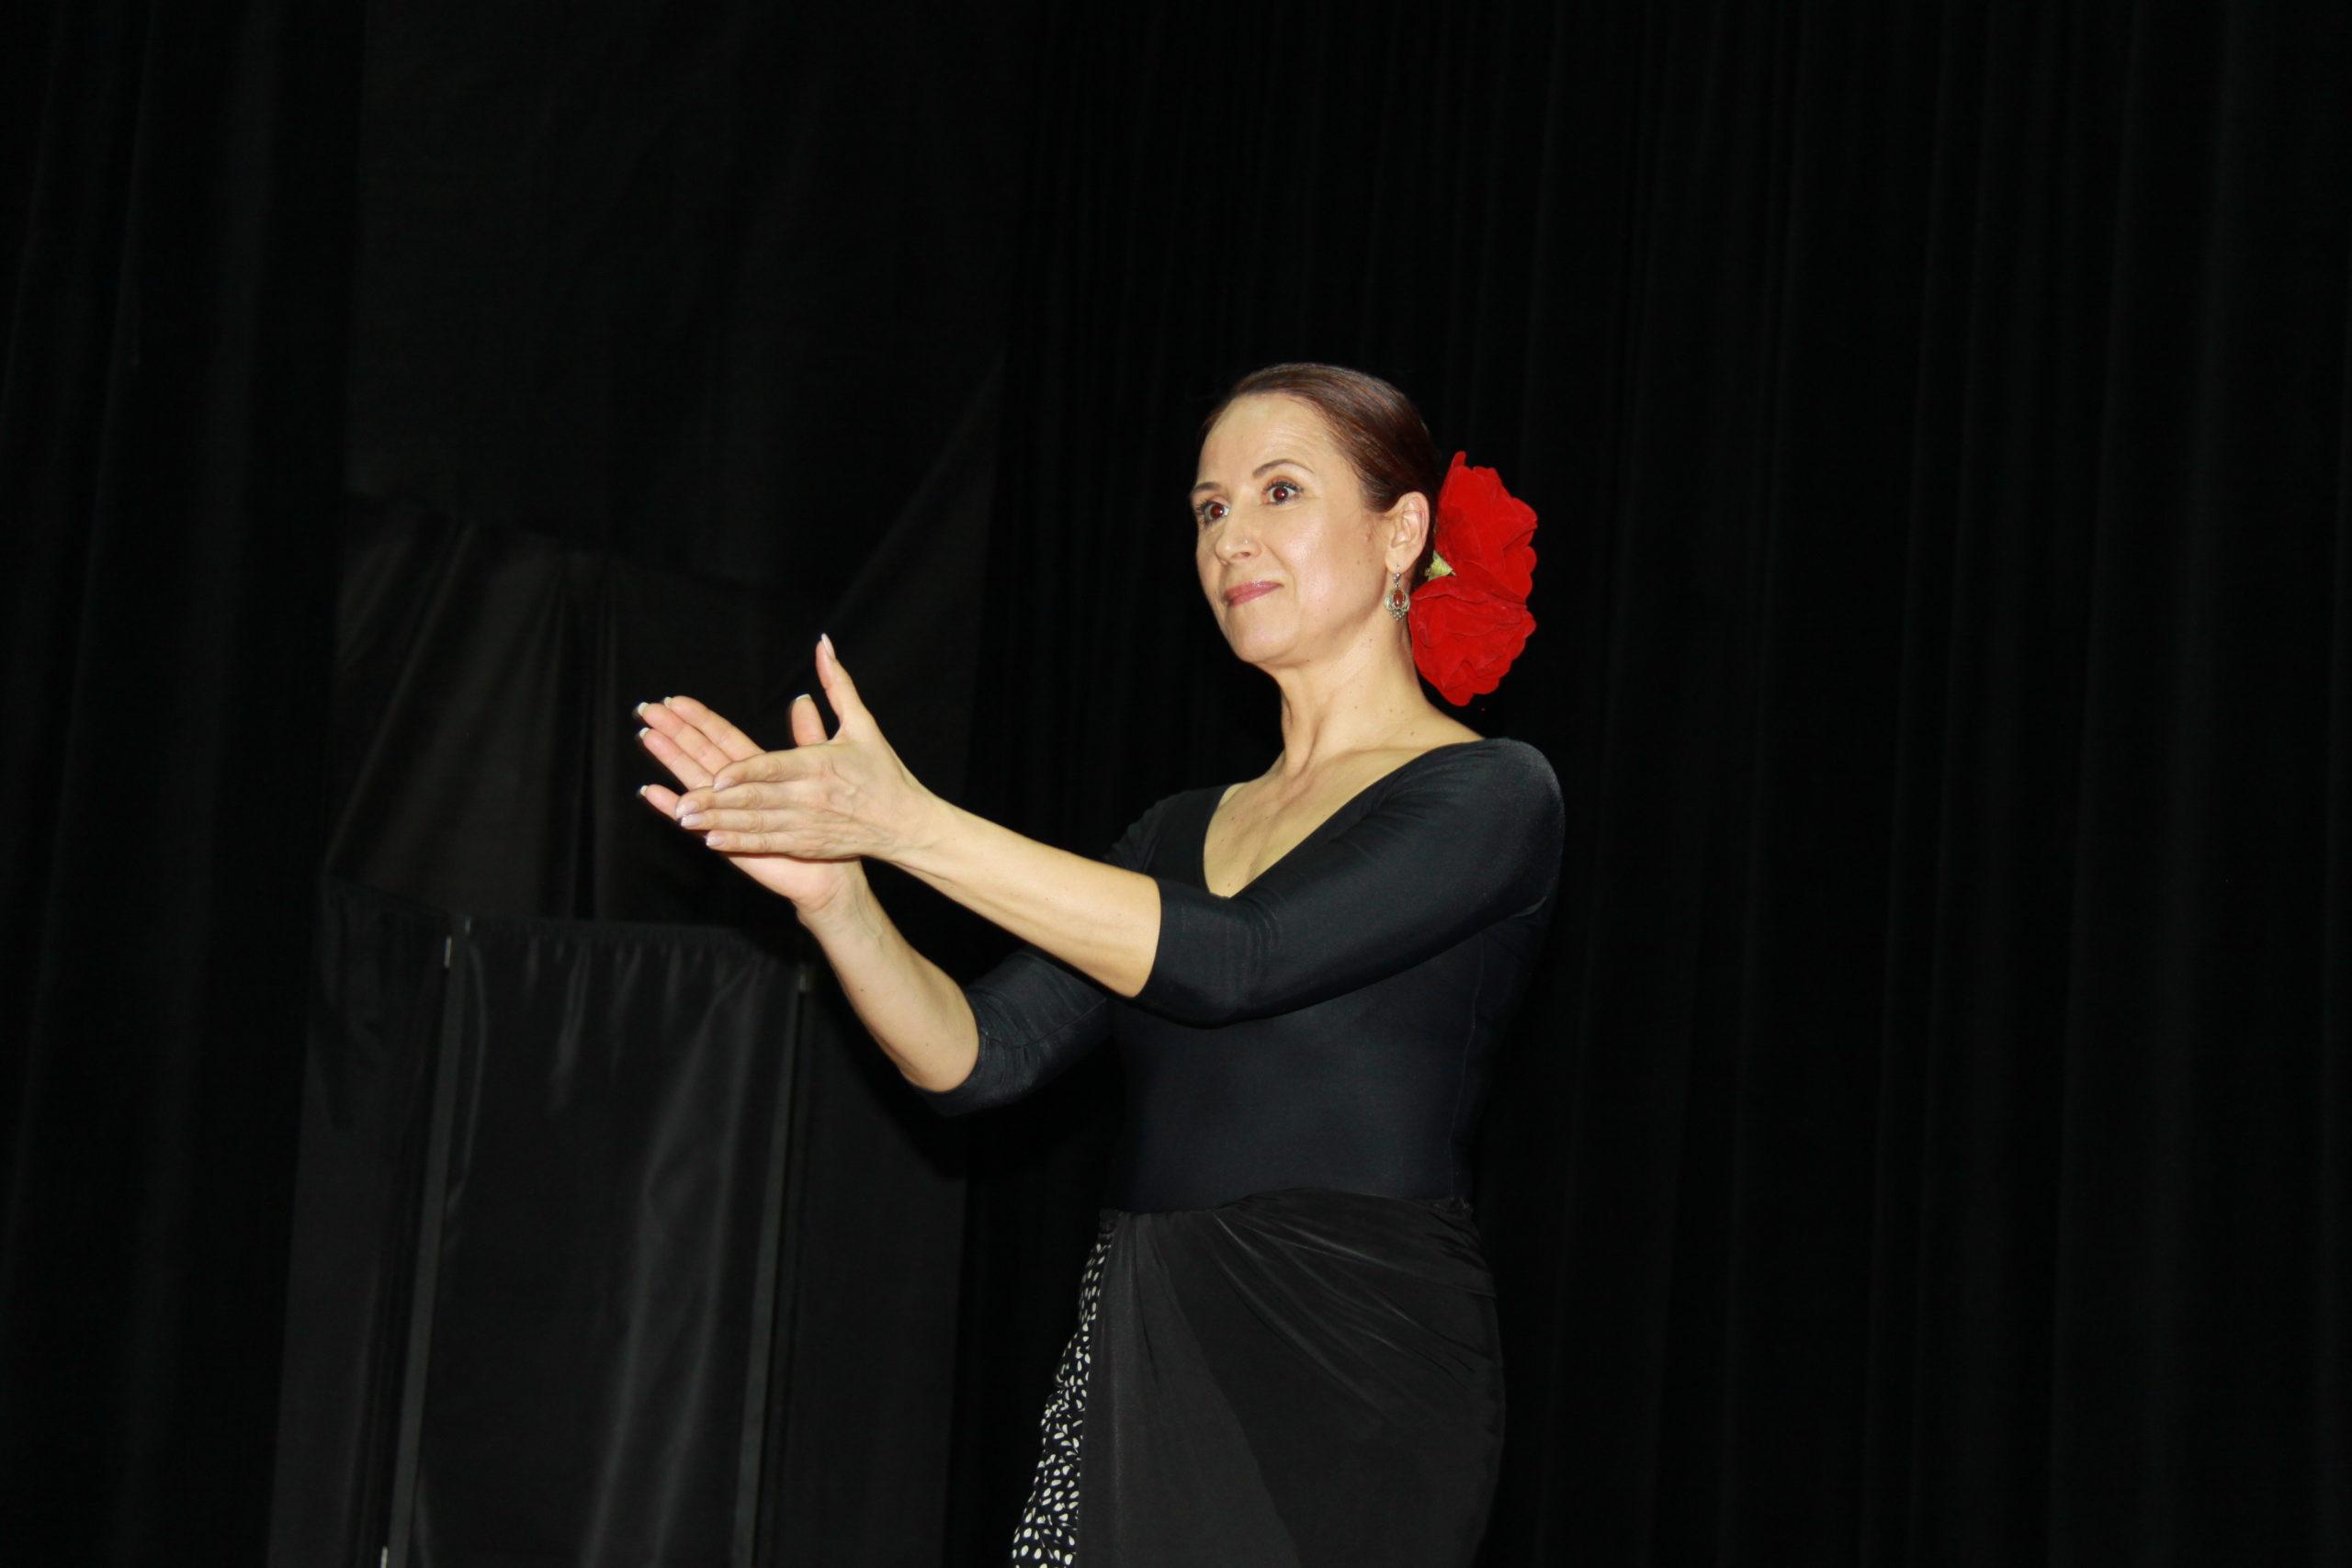 27.02.2020 Юлия Кругляк. Мастер-классы по фламенко. ИКИ41